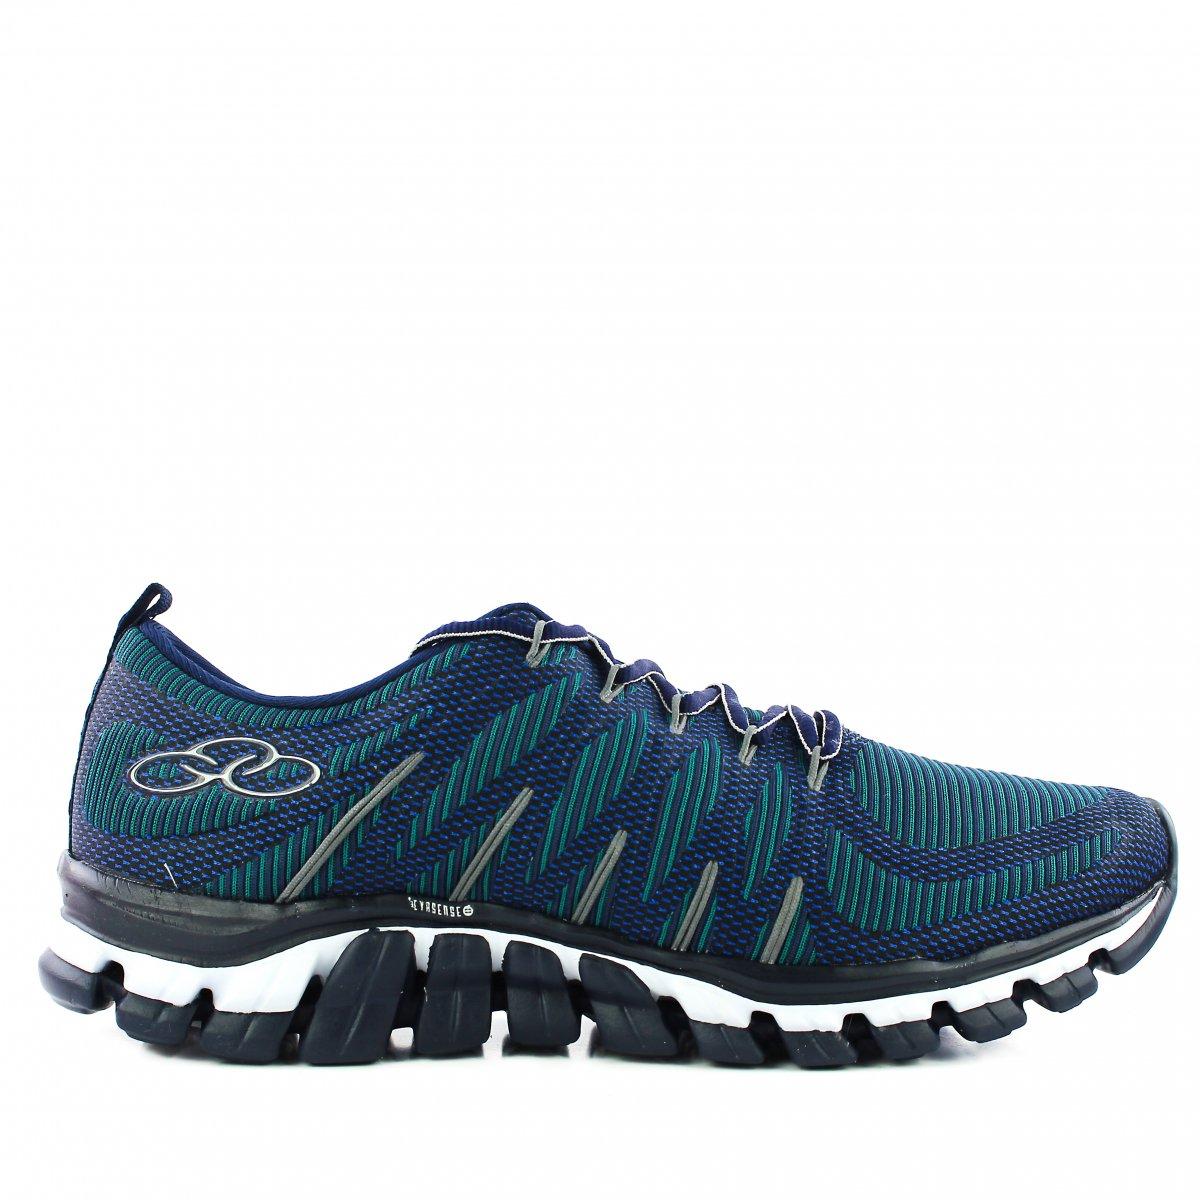 5d7ef9bc58 Tenis Olympikus Style / 298   Azul Marinho/verde   Coutope